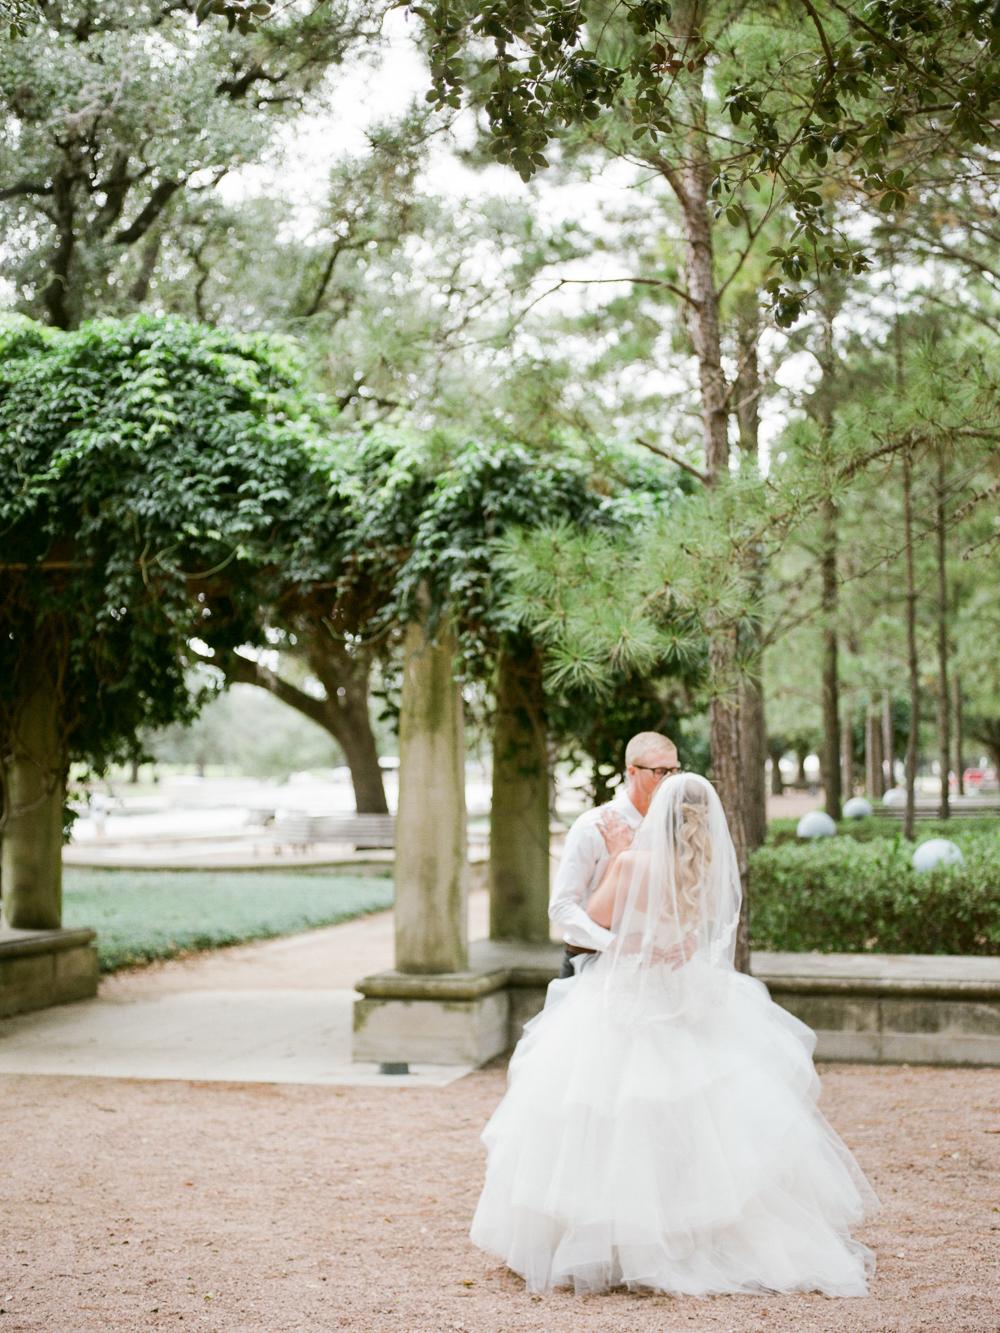 benefits of a first look_wedding photography_wedding photographer_film wedding photographer_Christine Gosch_www.christinegosch.com_Houston, Texas wedding photographer_ Houston, Texas-16.jpg